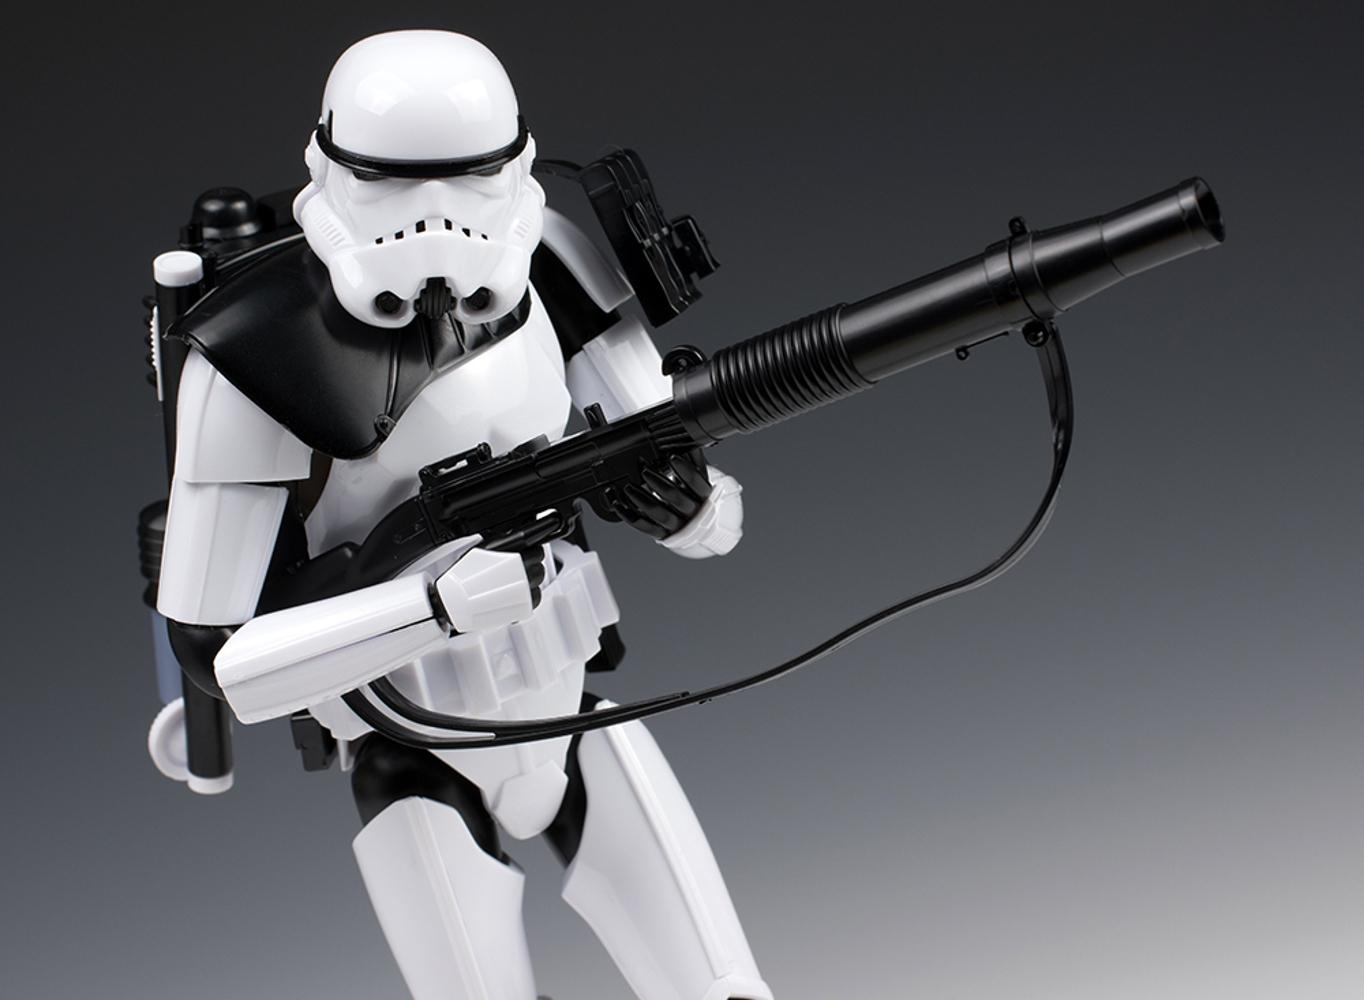 Bandai Star Wars 1/12 Sandtrooper Figure Model Kit 4543112973481